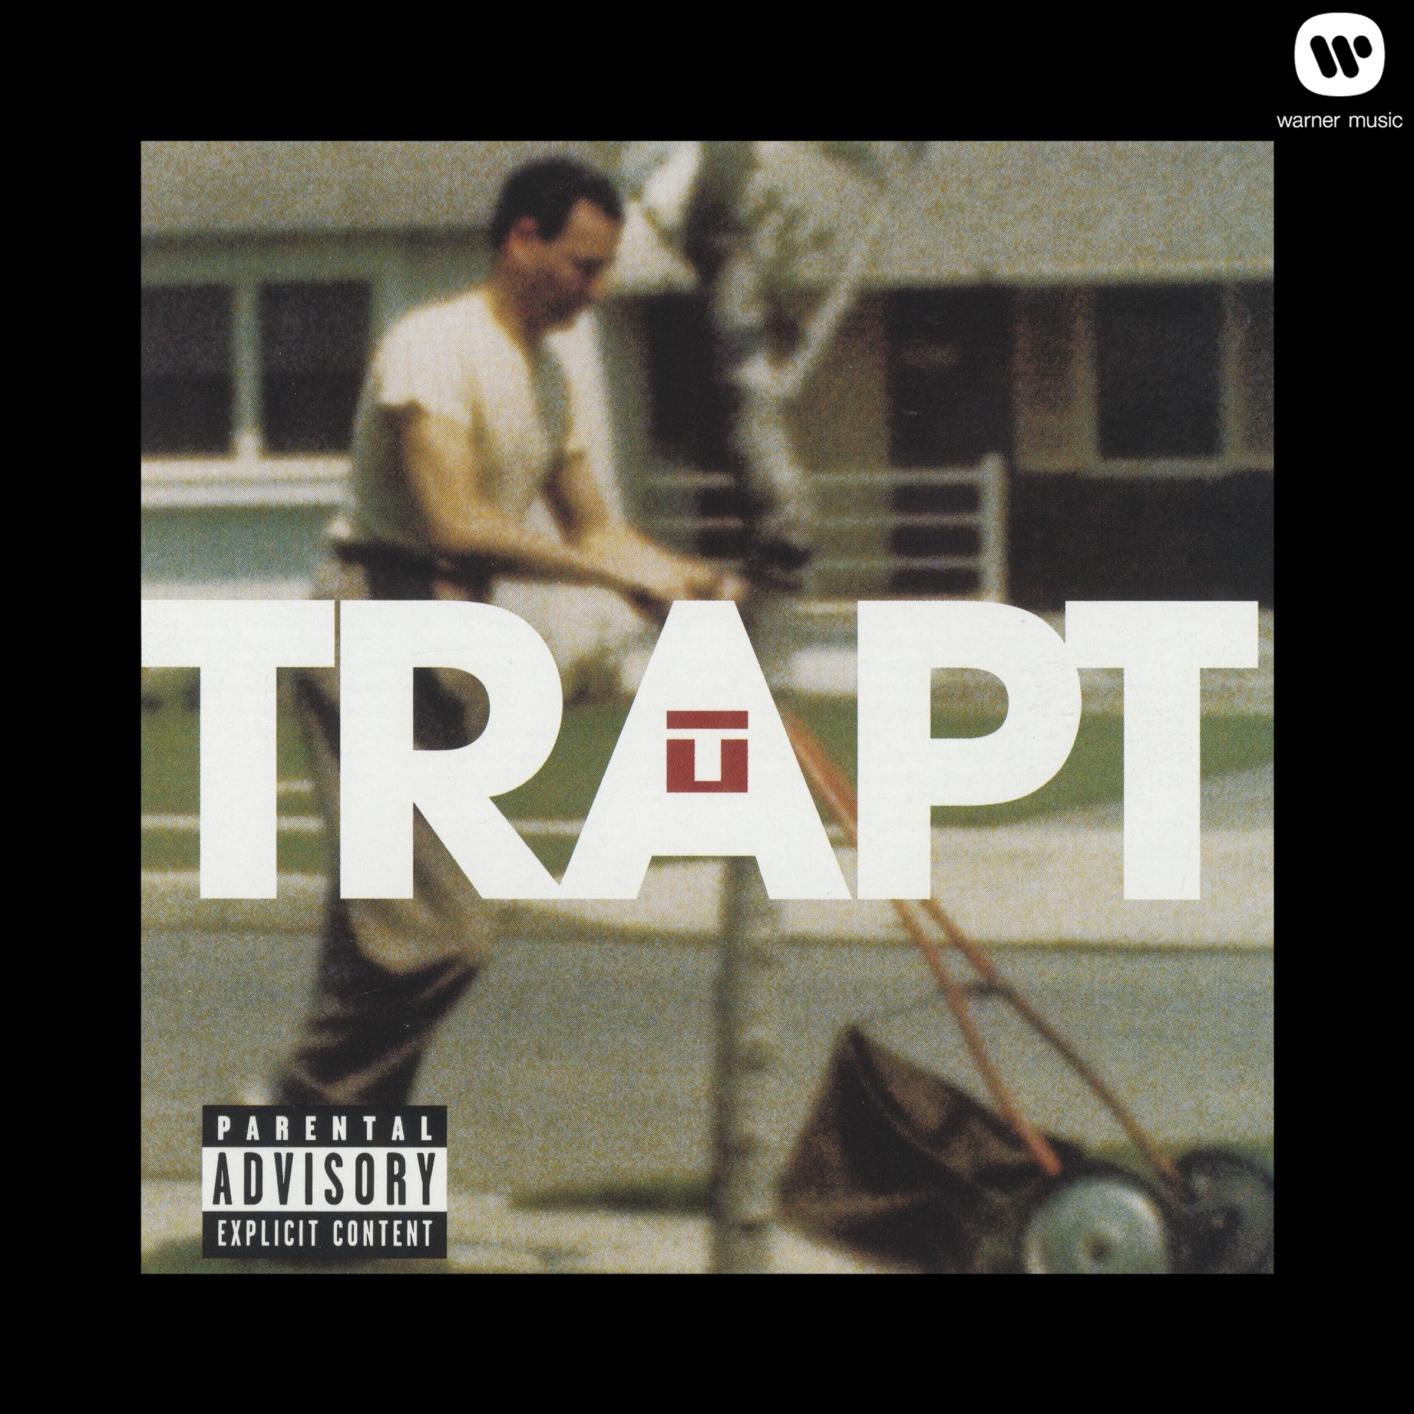 Trapt | HIGHRESAUDIO